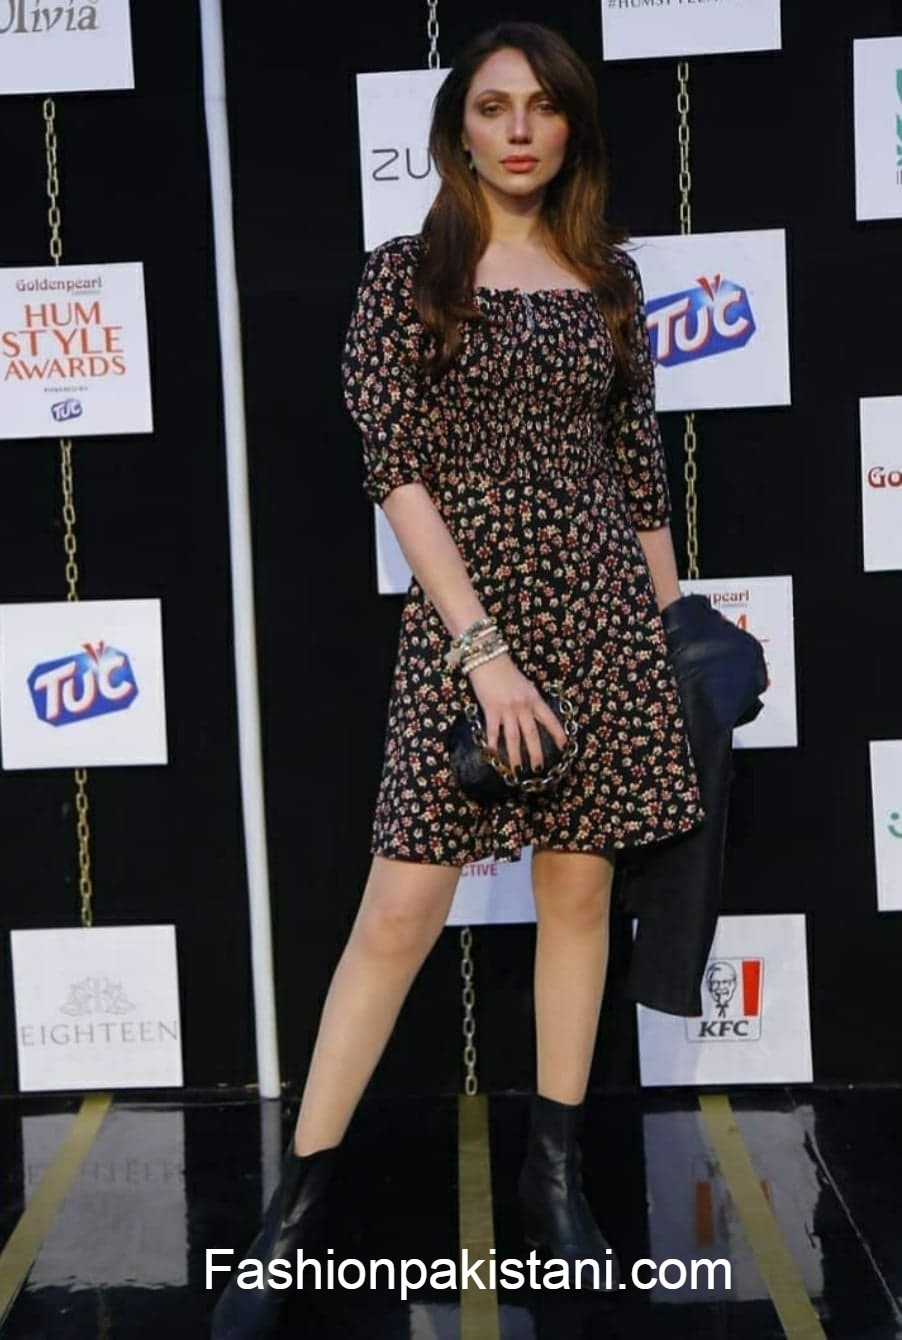 Zarmeena Ikram hum award 2020